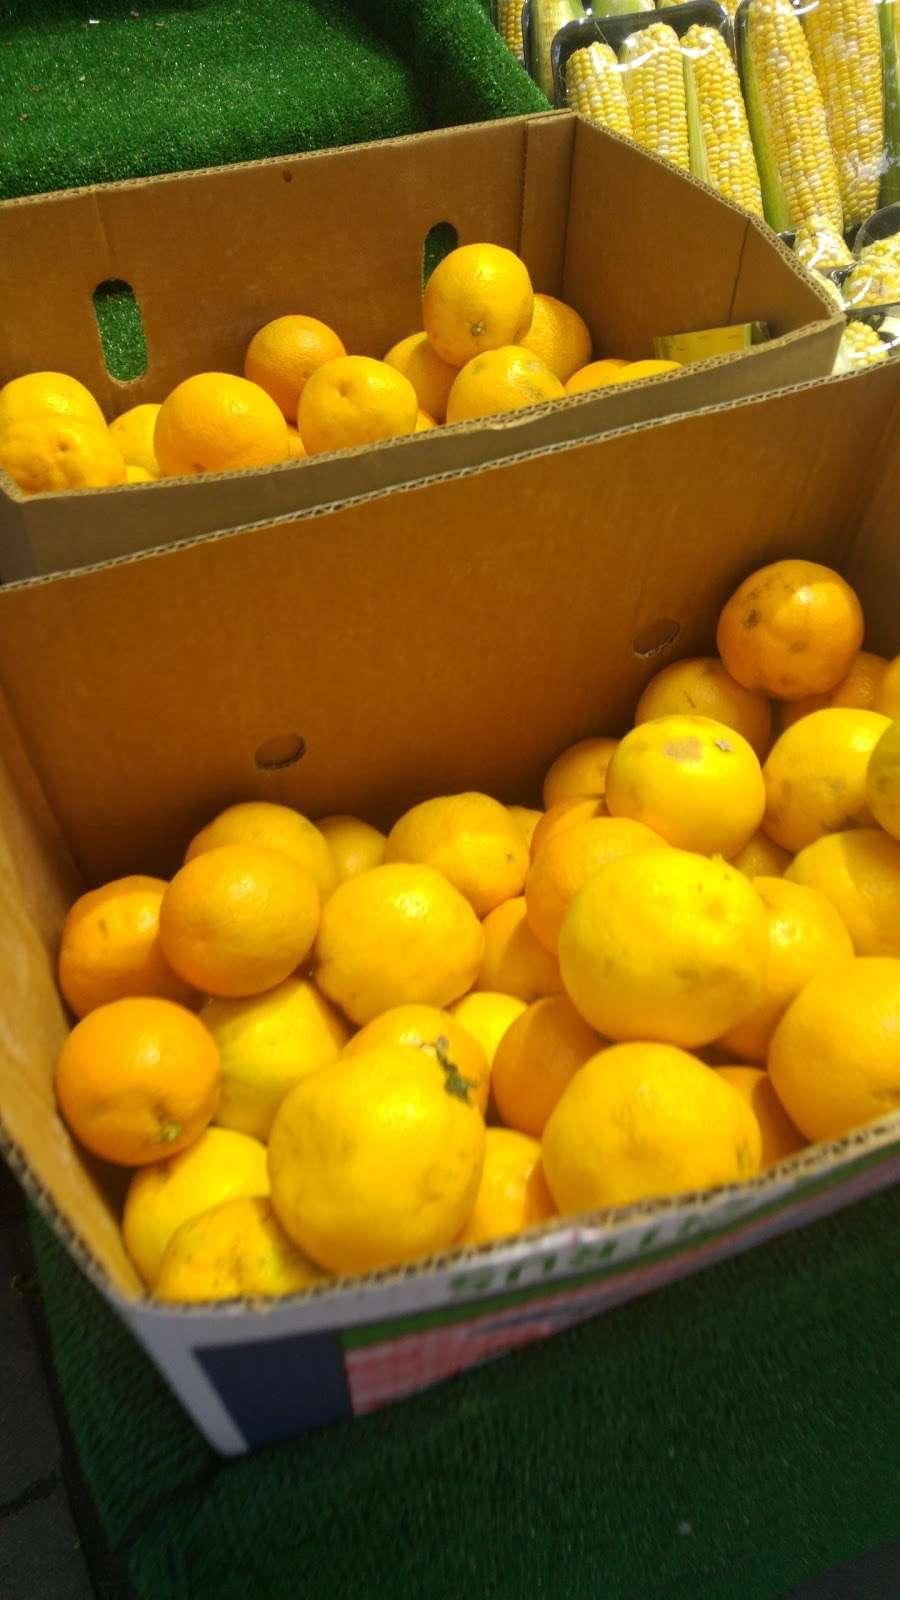 Raskins Fruit & Produce - store    Photo 9 of 10   Address: 335 Kingston Ave, Brooklyn, NY 11213, USA   Phone: (718) 756-3888